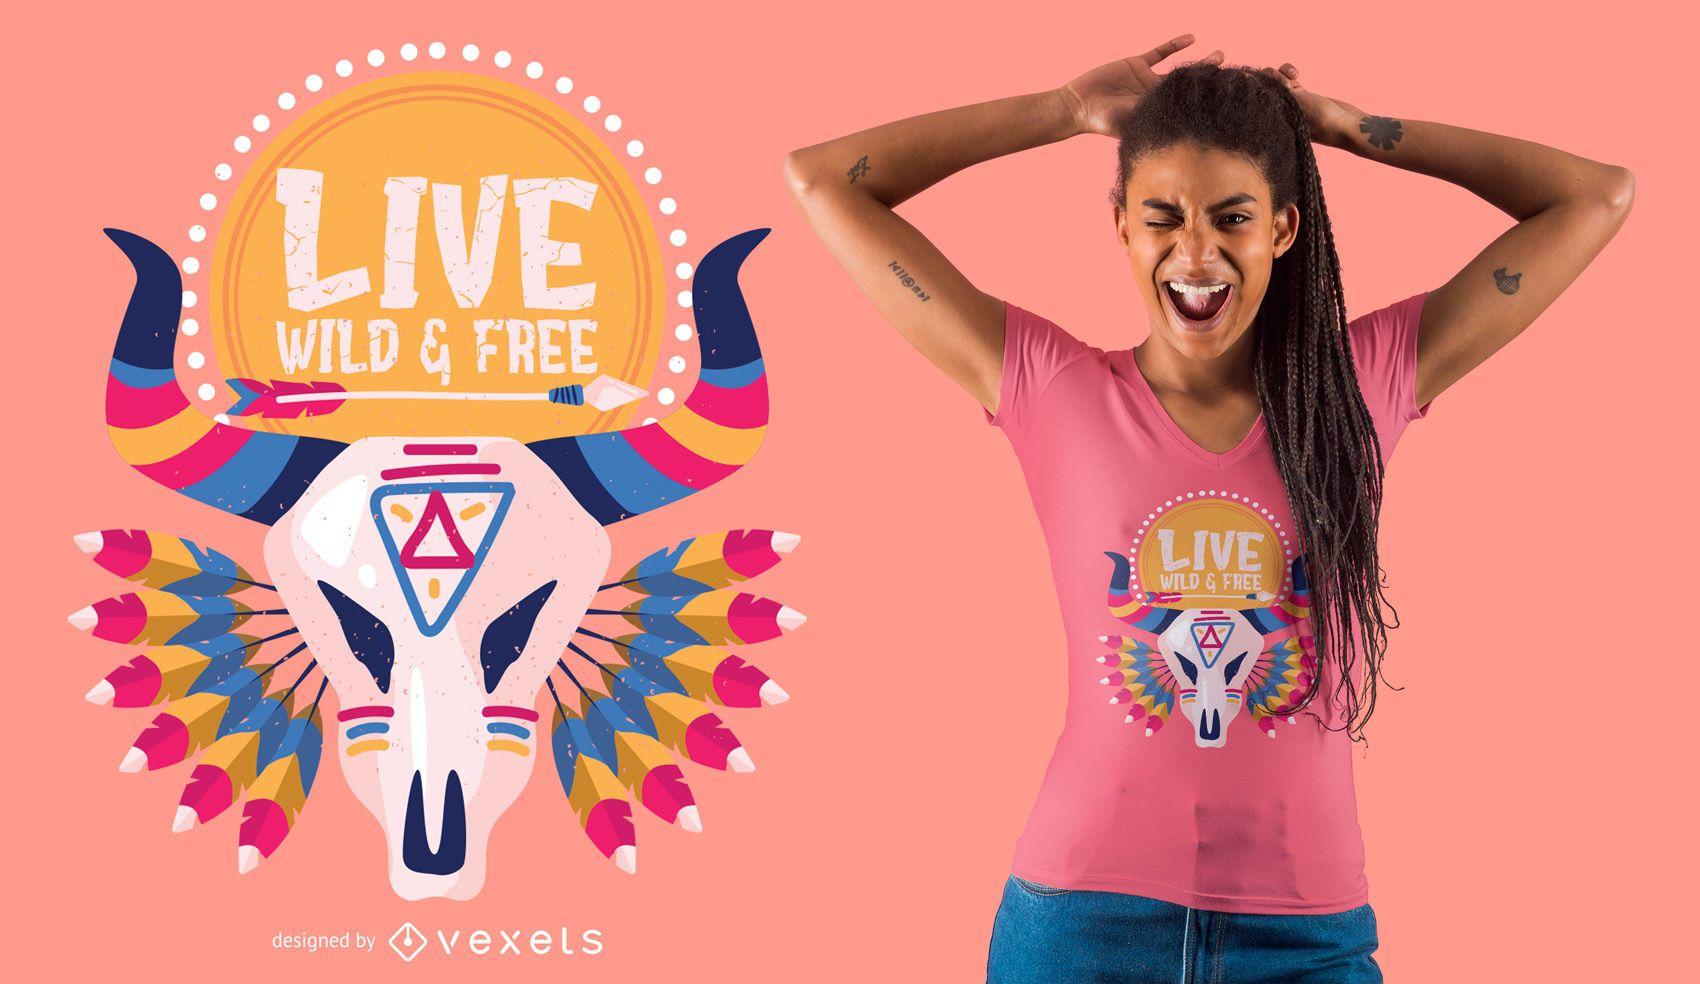 Live Wild & Free T-shirt Design